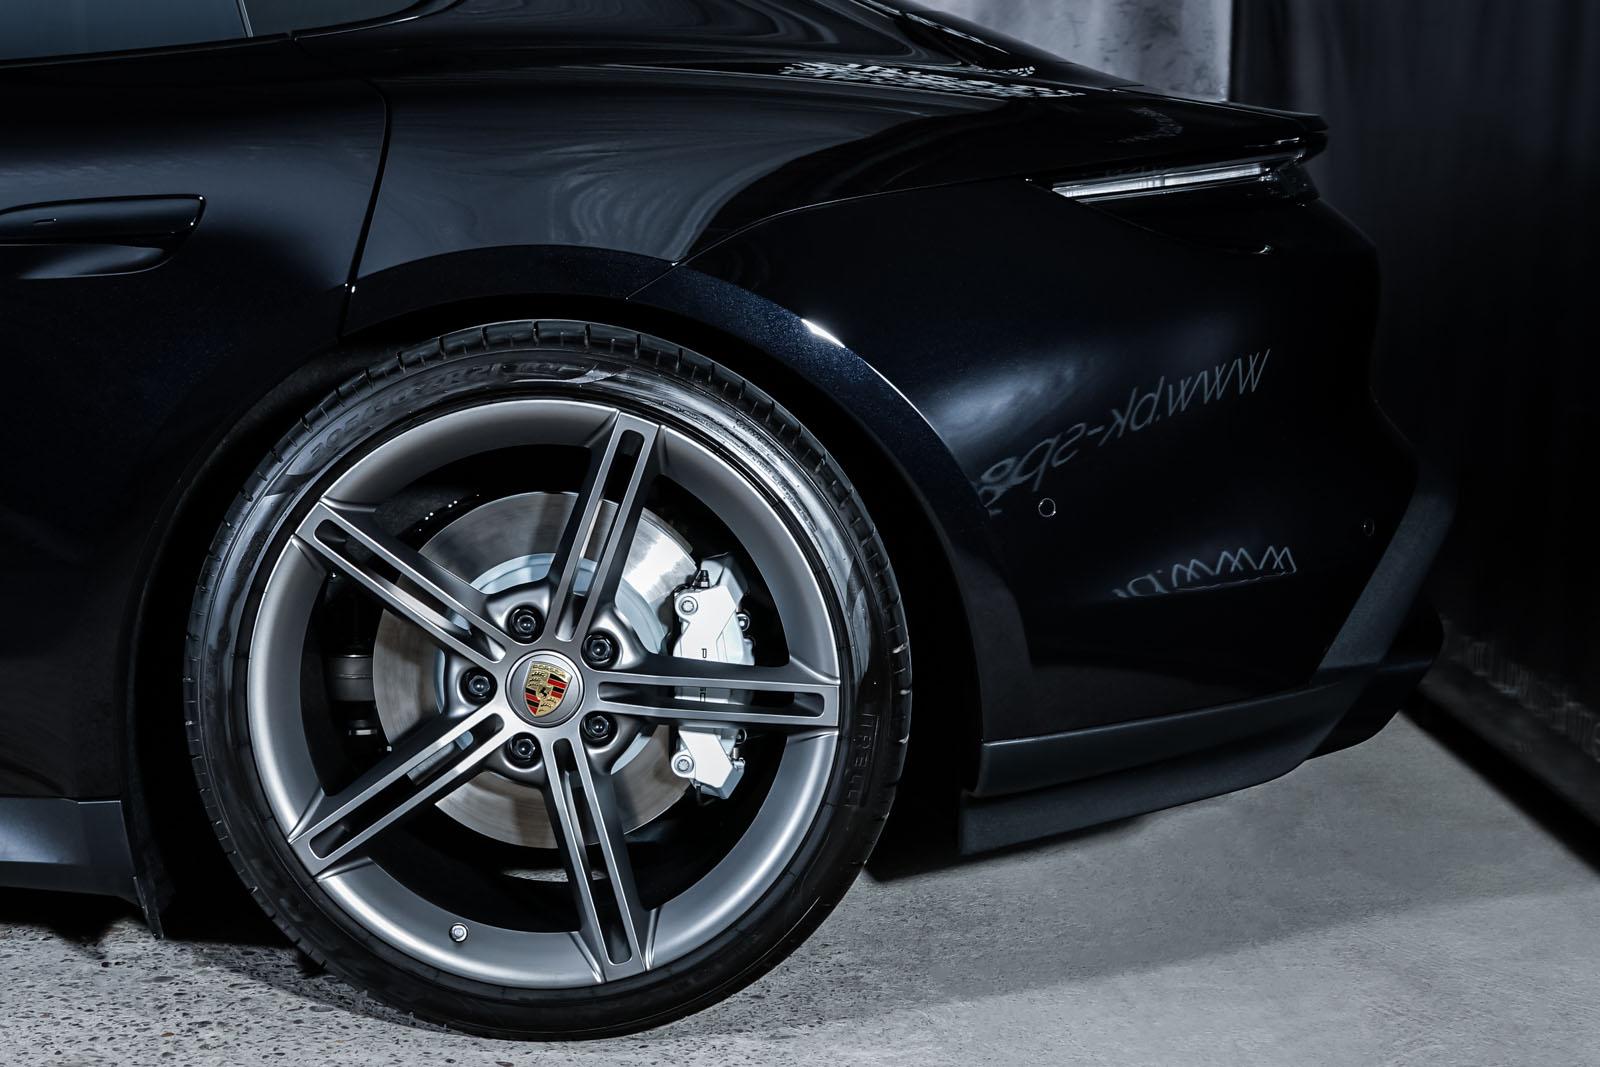 Porsche_Taycan_Turbo_Schwarz_Schwarz_POR-8106_4_w